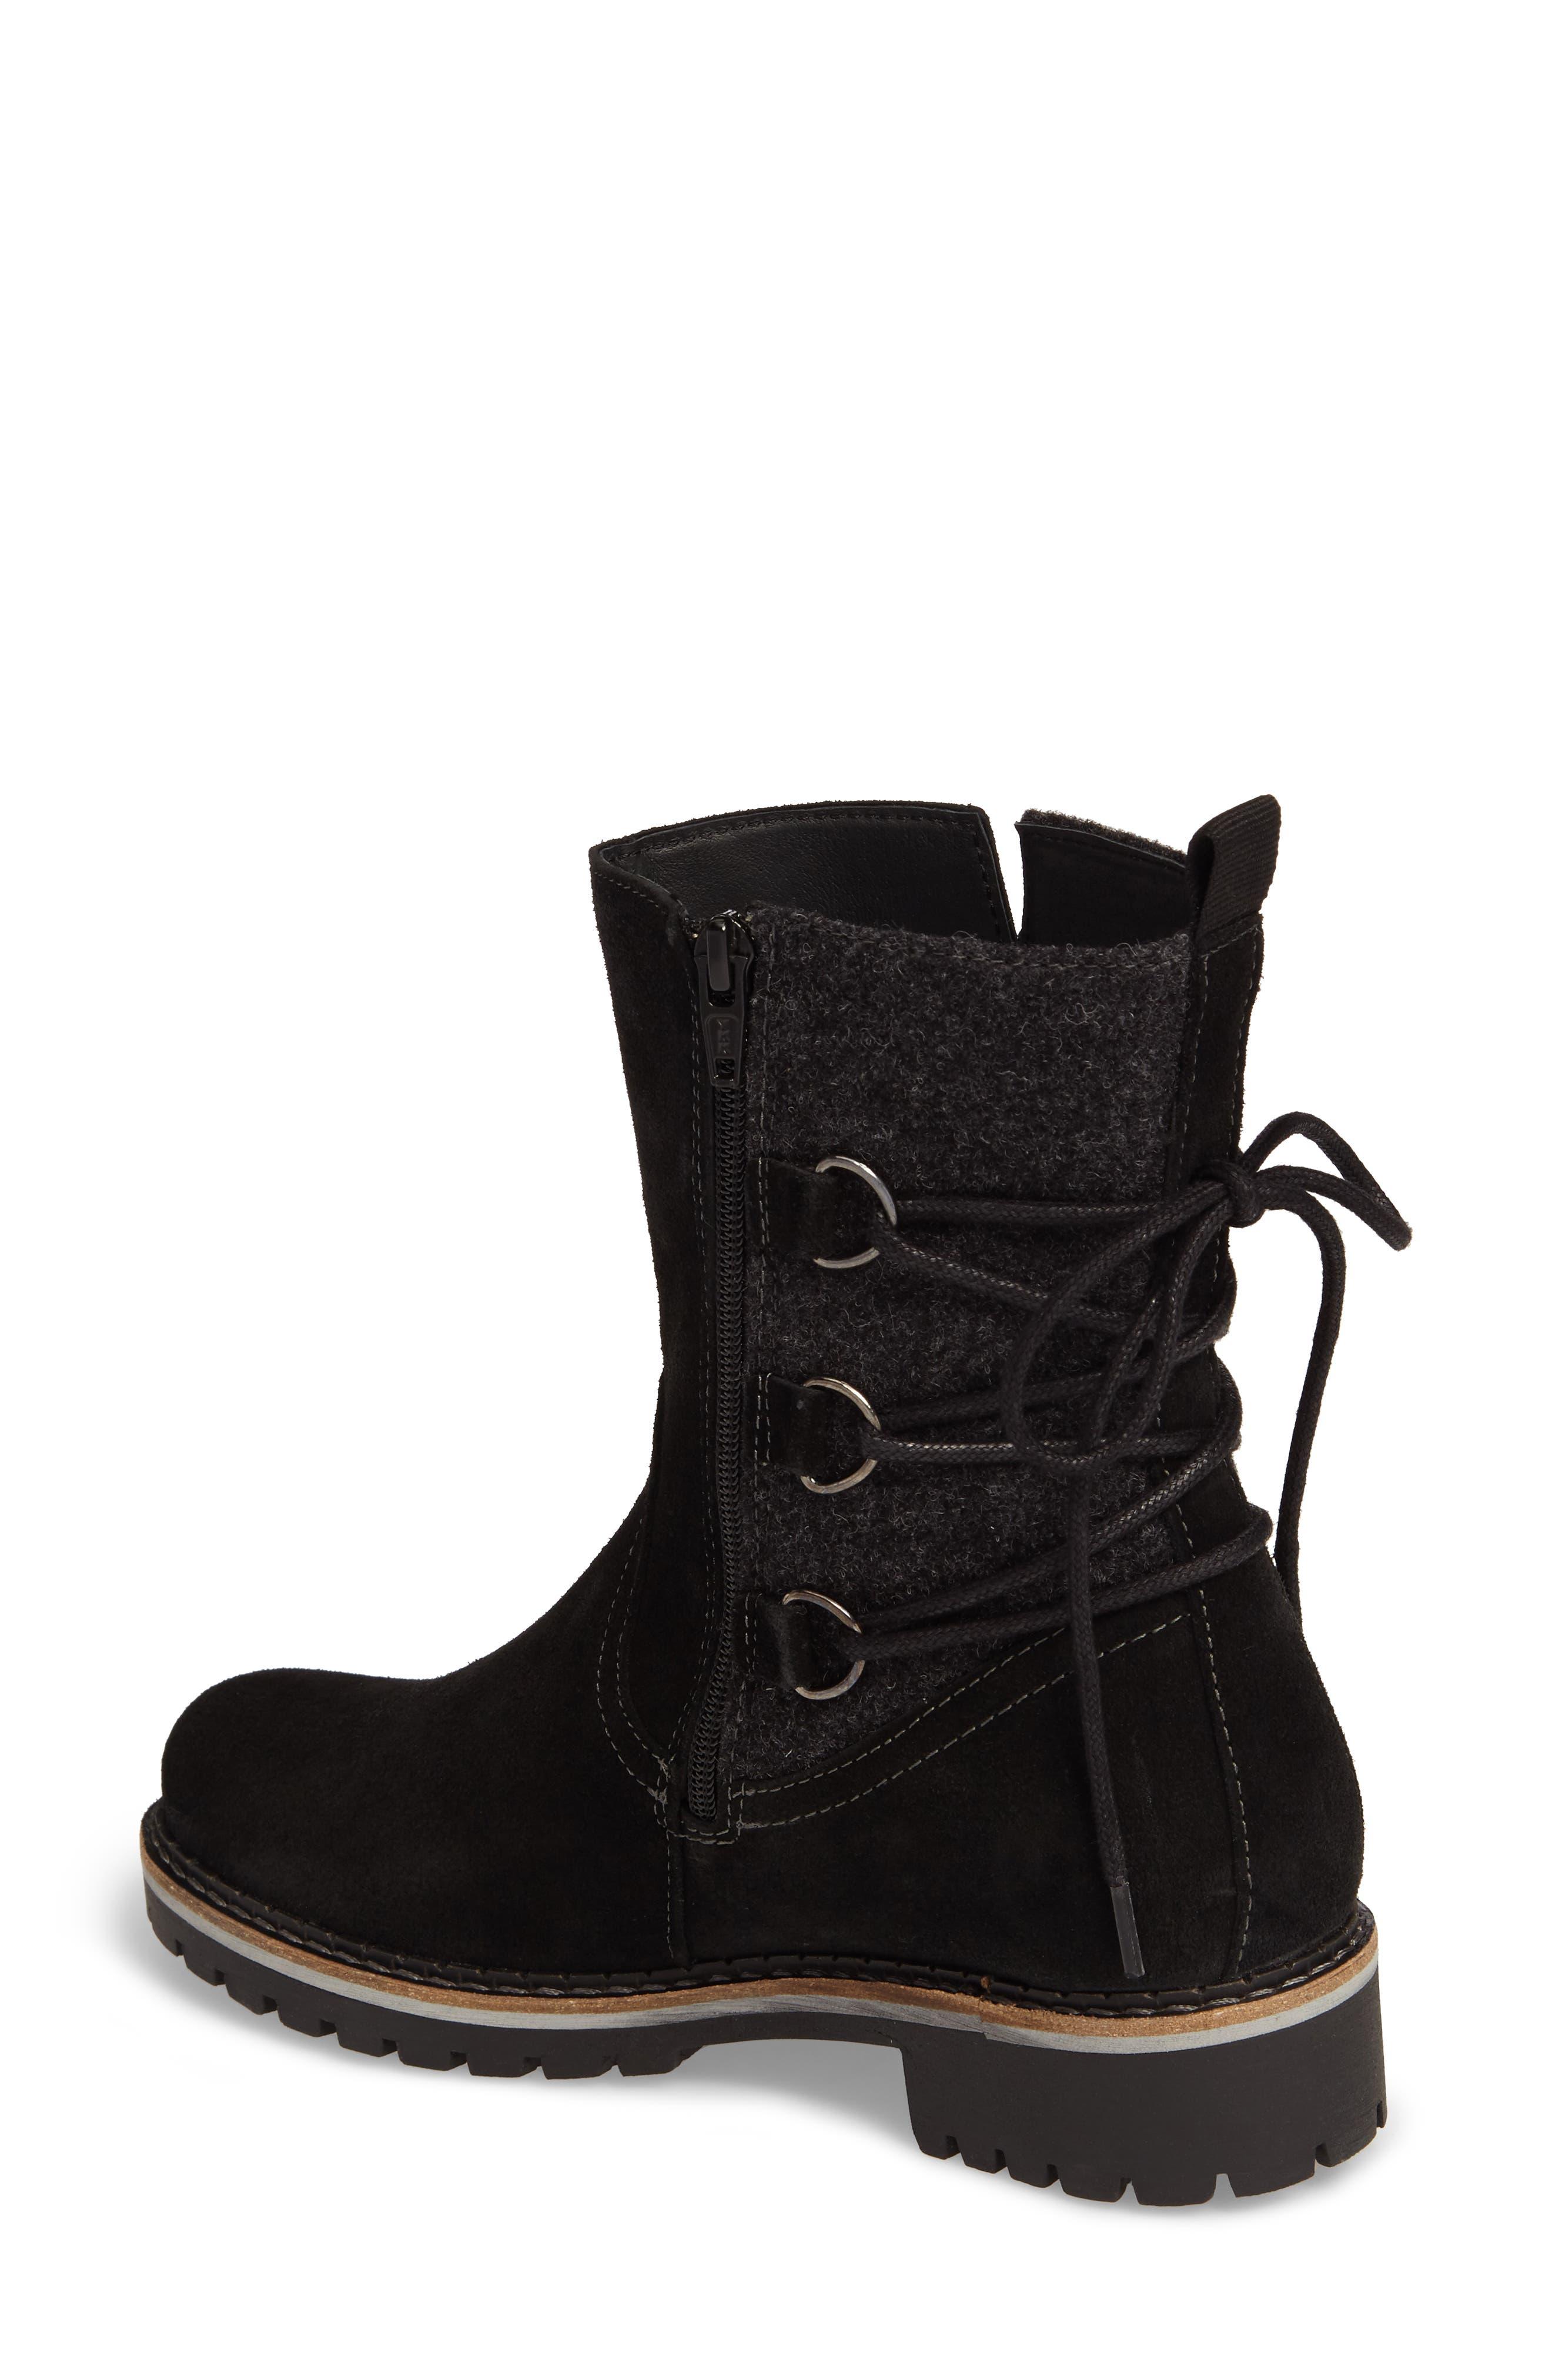 Cascade Waterproof Boot,                             Alternate thumbnail 2, color,                             Black/ Grey Suede